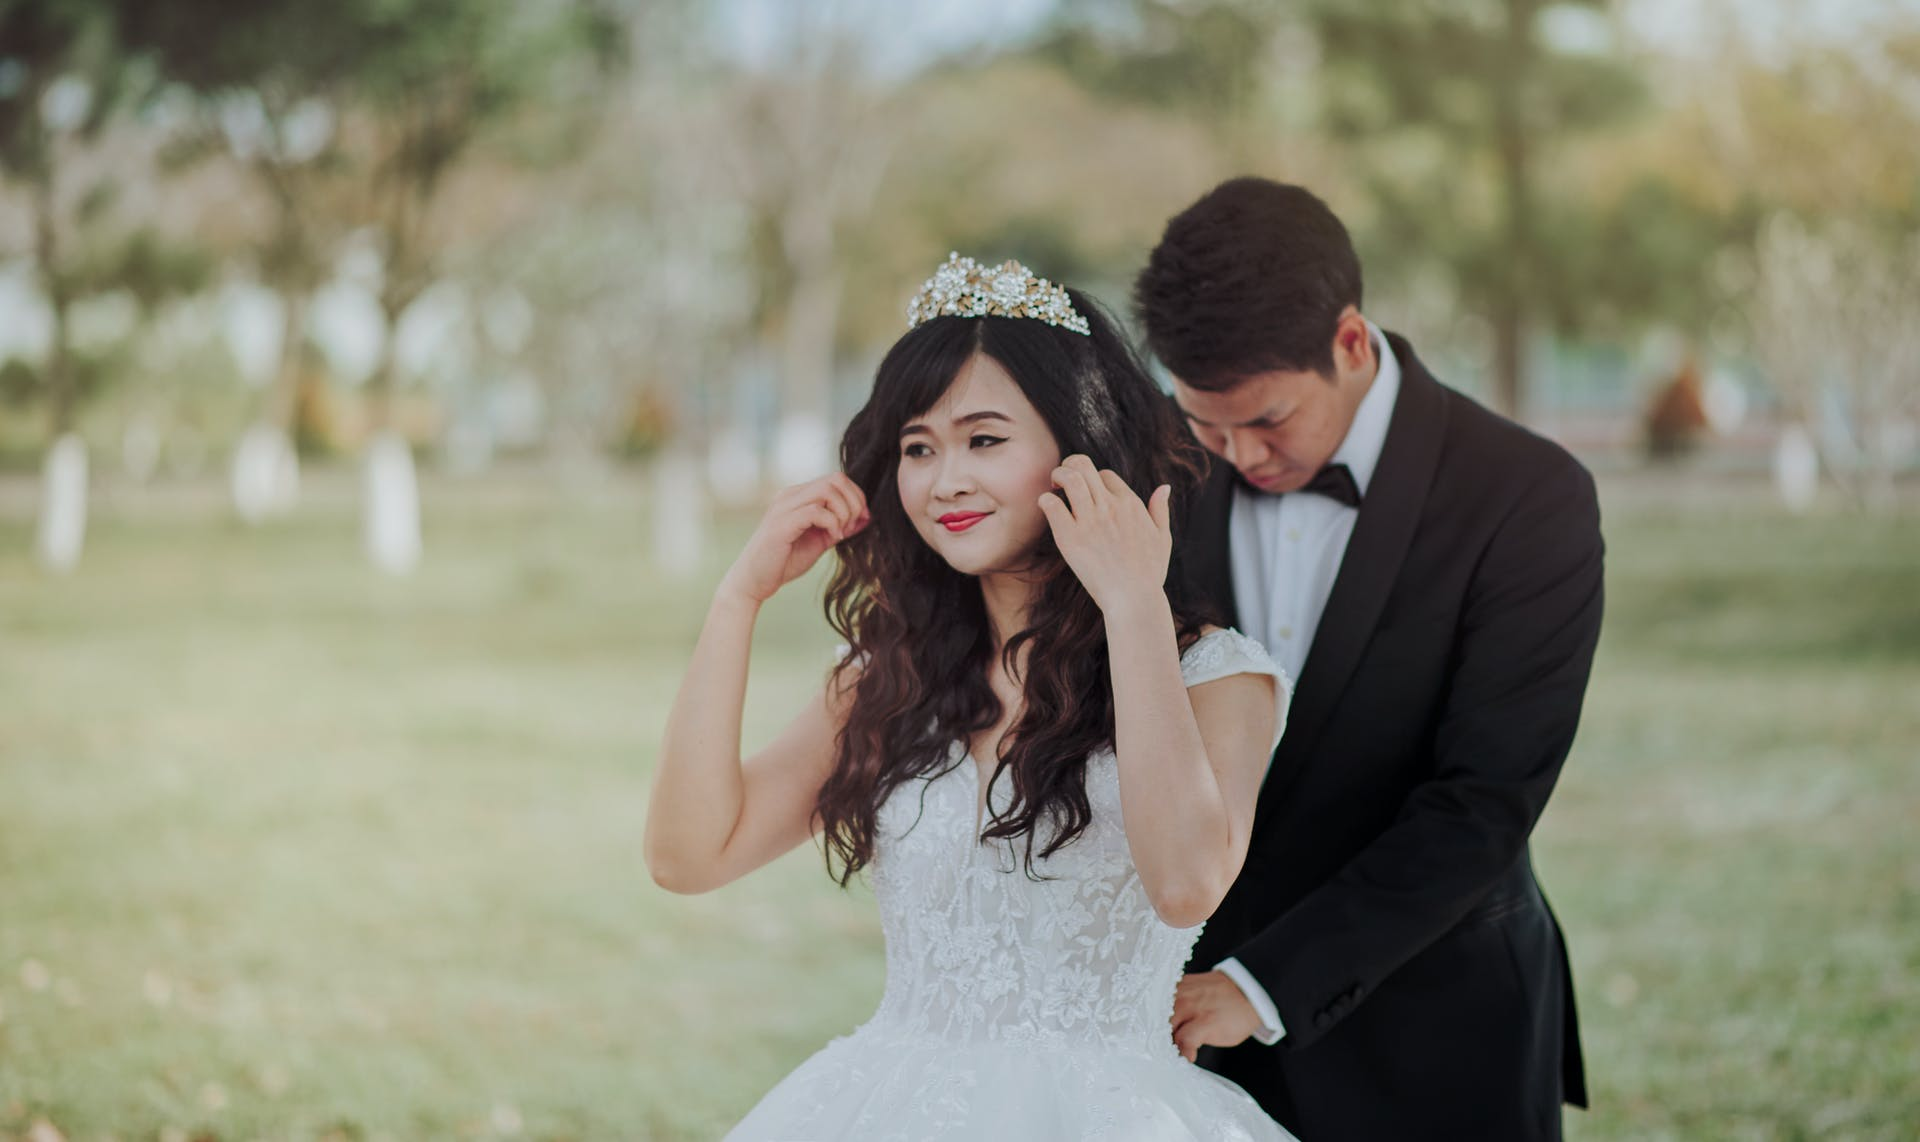 Wedding-Dresses-3898